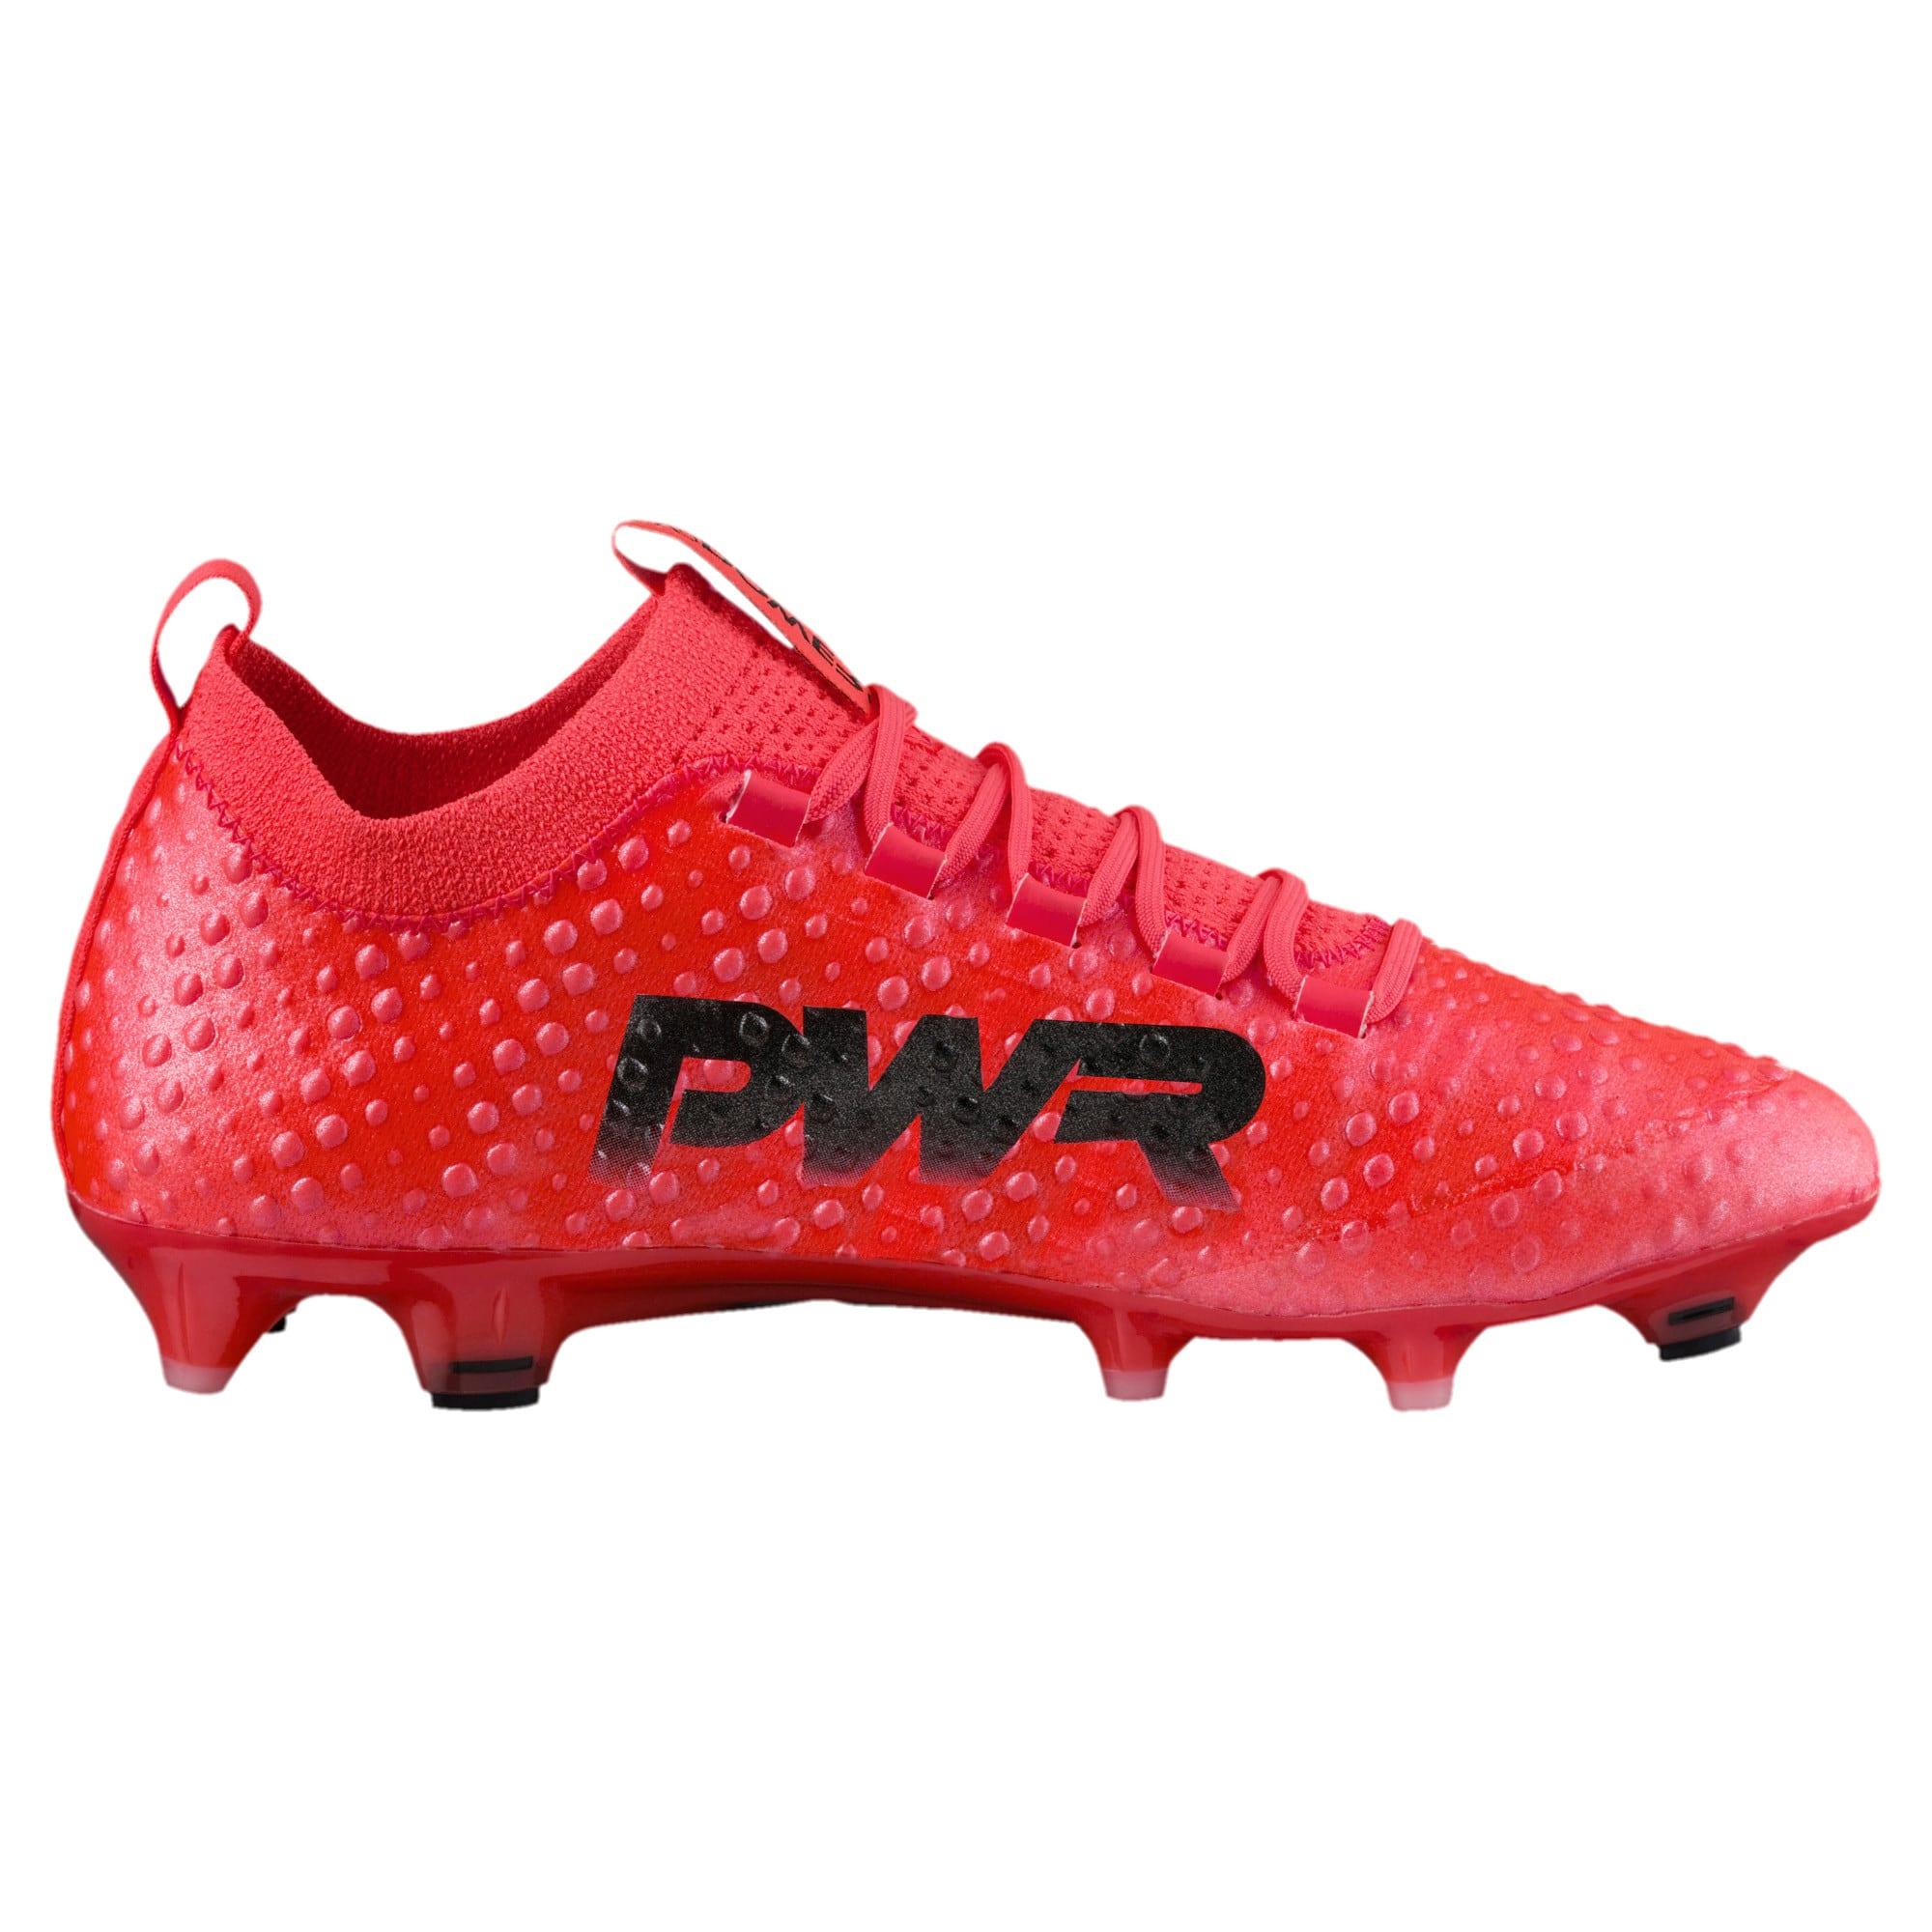 Thumbnail 3 of evoPOWER Vigor 3D 1 FG Men's Firm Ground Soccer Cleats, Coral-Black-Toreador, medium